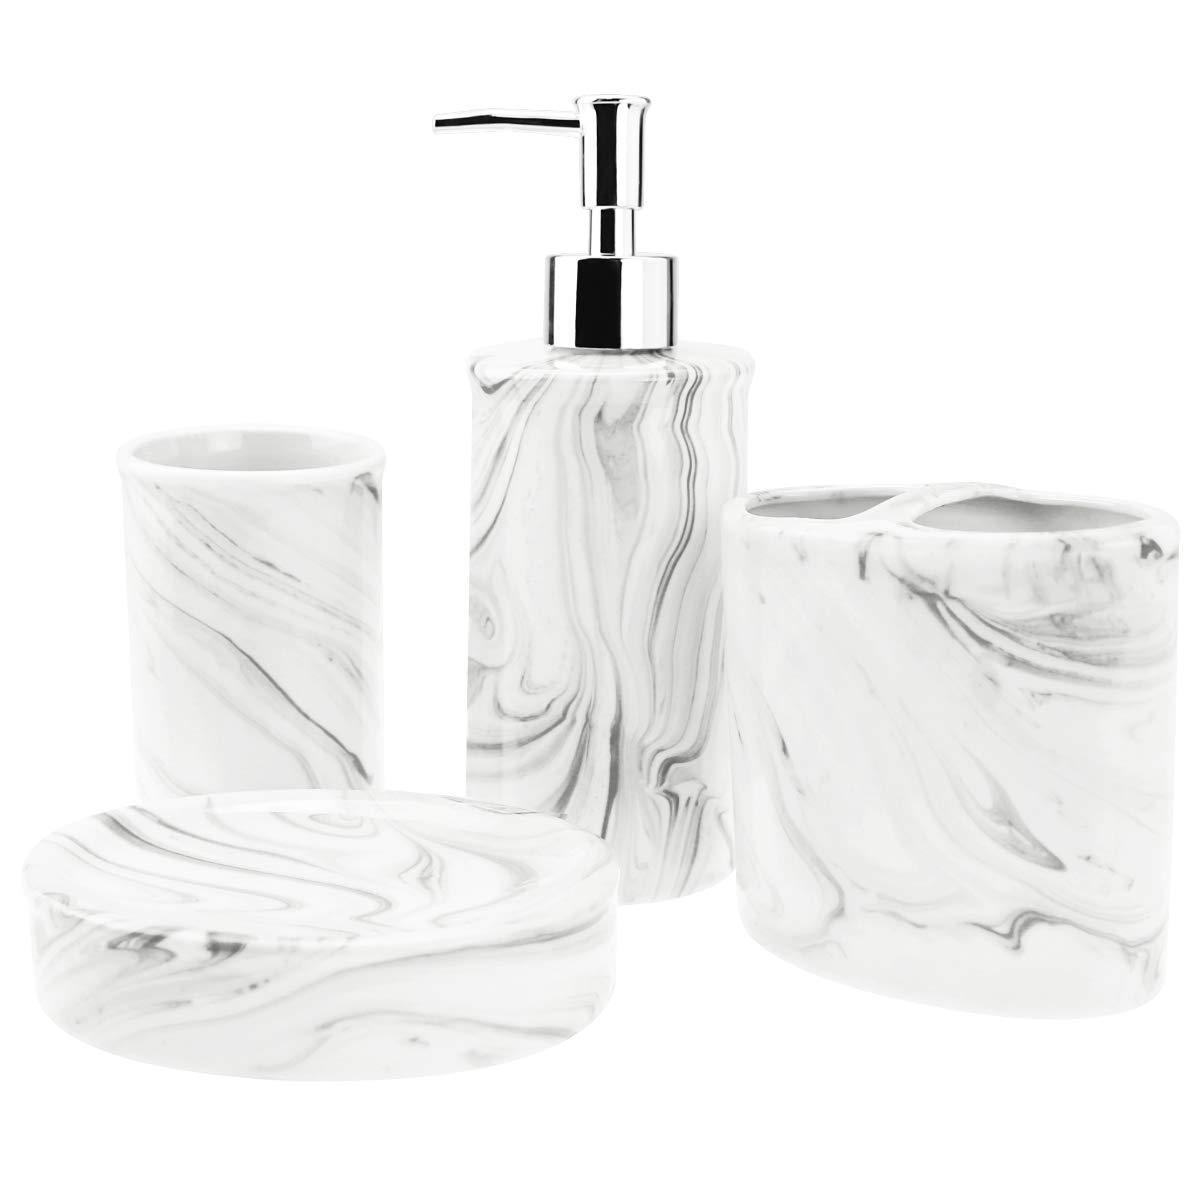 4-Piece Ceramic Bathroom Accessories Set, Complete Marble Style Bathroom Ensemble Sets for Bath Decor Includes Soap Dispenser Pump, Toothbrush Holder, Tumbler, Soap Dish, Ideas Home Gift(Black)